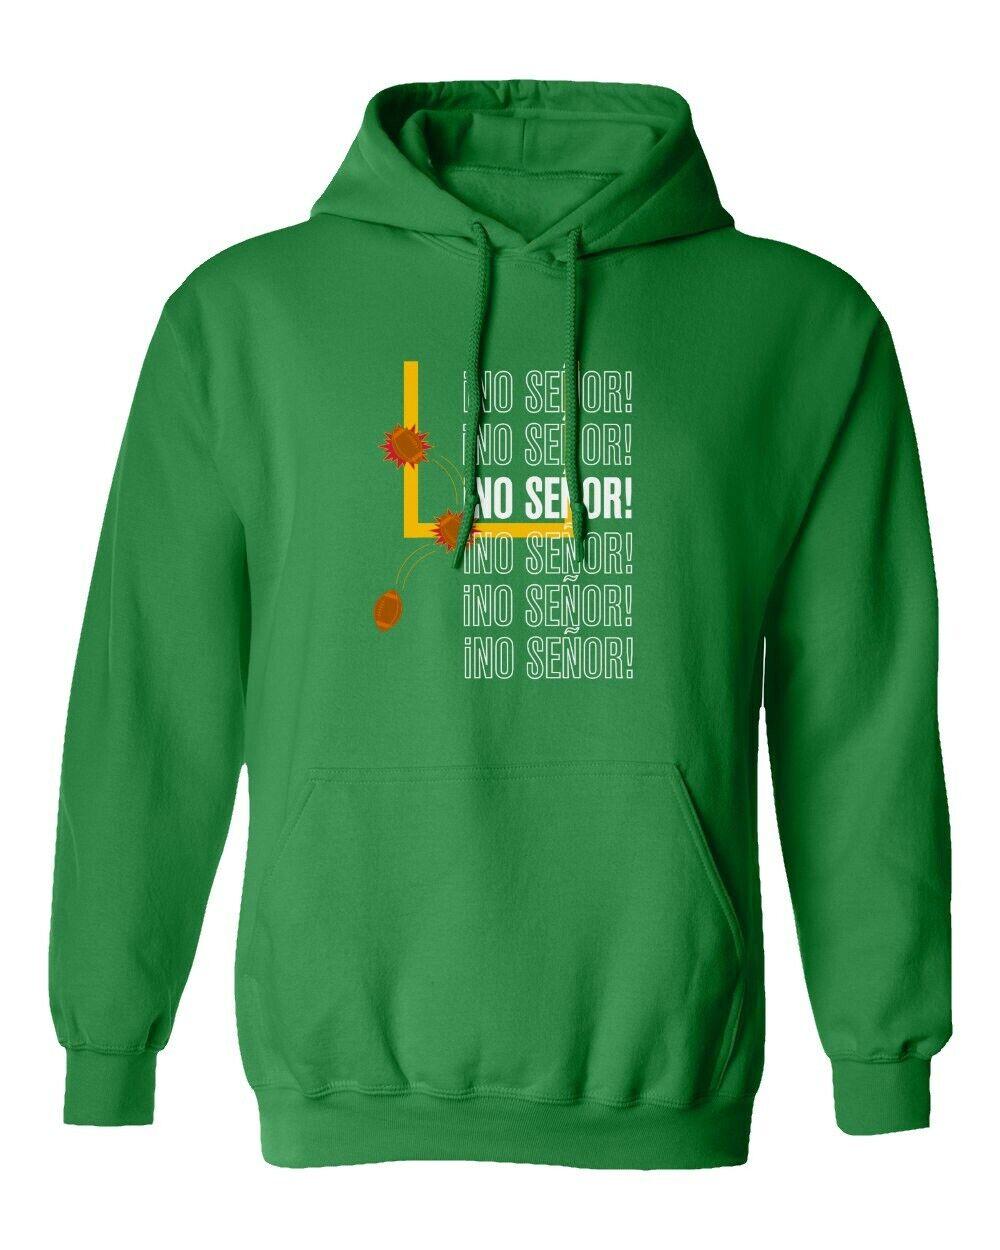 Philadelphia Eagles NO SENOR Cody Parkey Miss Men's Hooded Sweatshirt